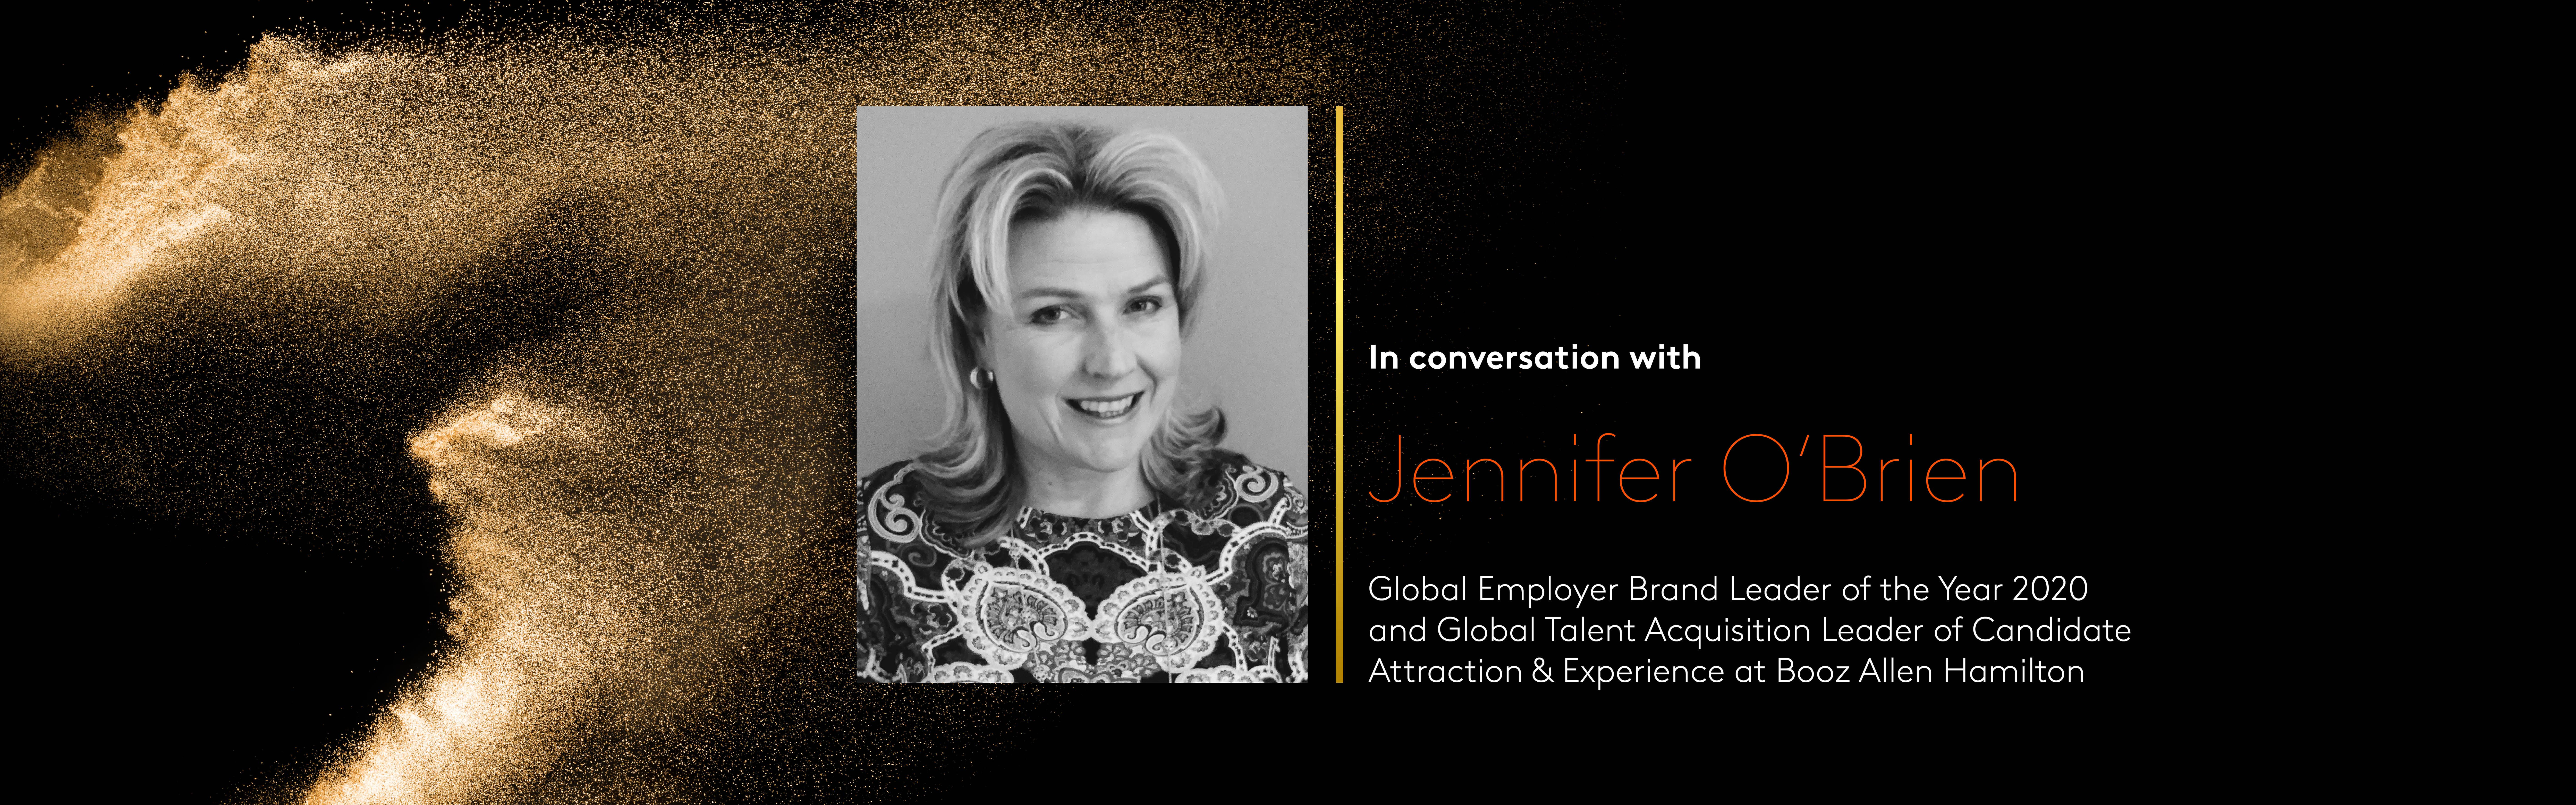 Kantar in conversation with Jennifer O'Biren